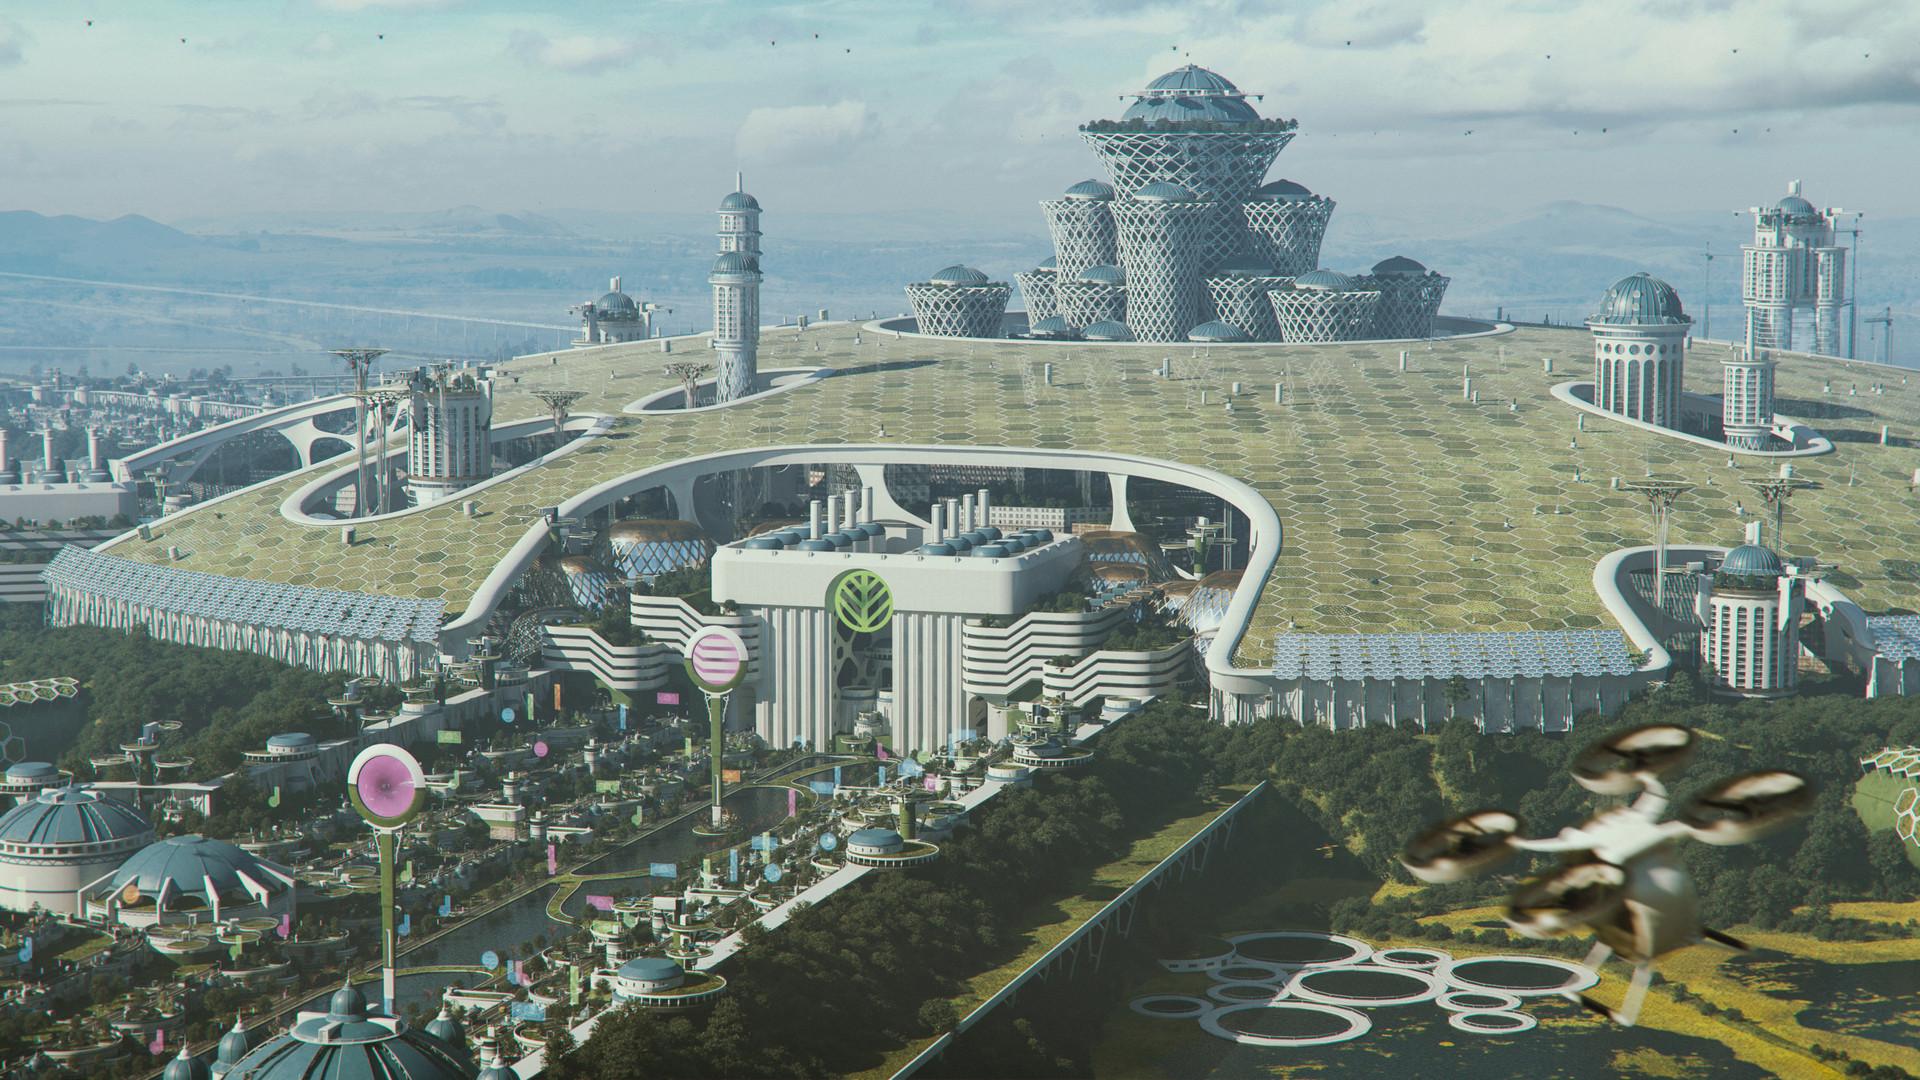 Metropia 2023